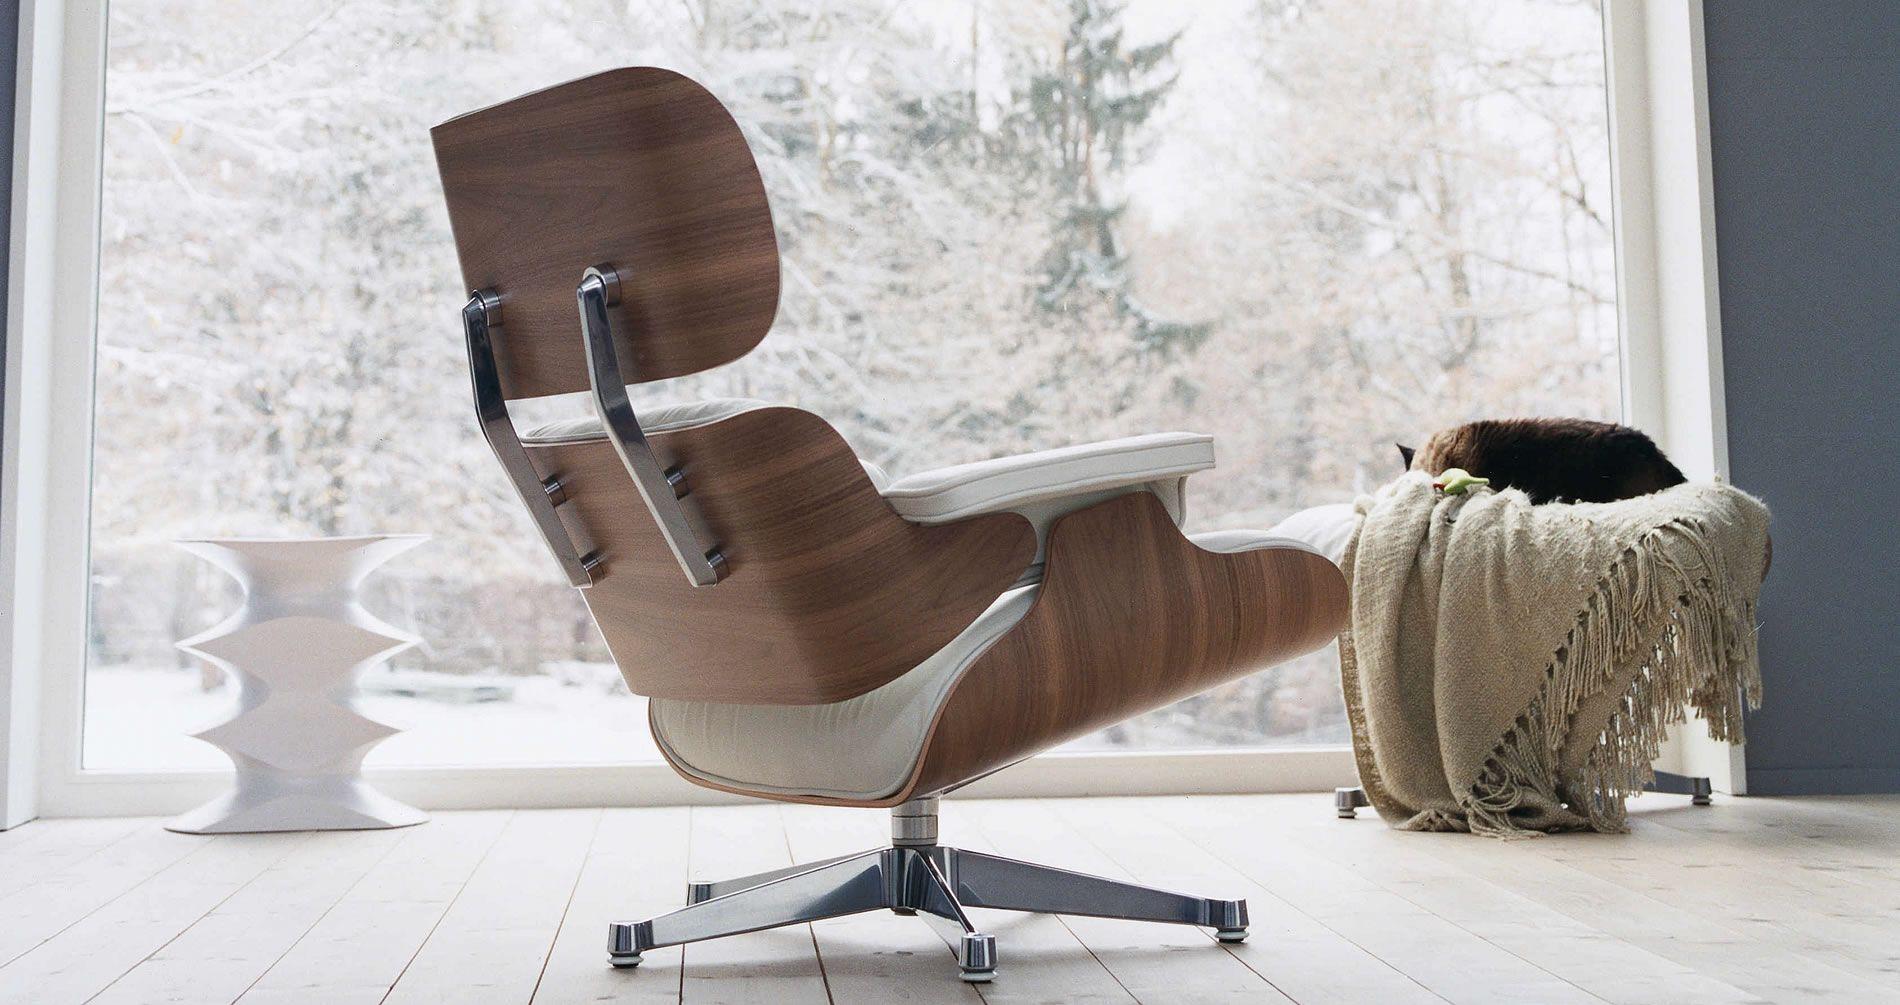 Fplus lounge chair with ottoman. Eames Lounge Chair Vitra Arredamento Sedie Legno